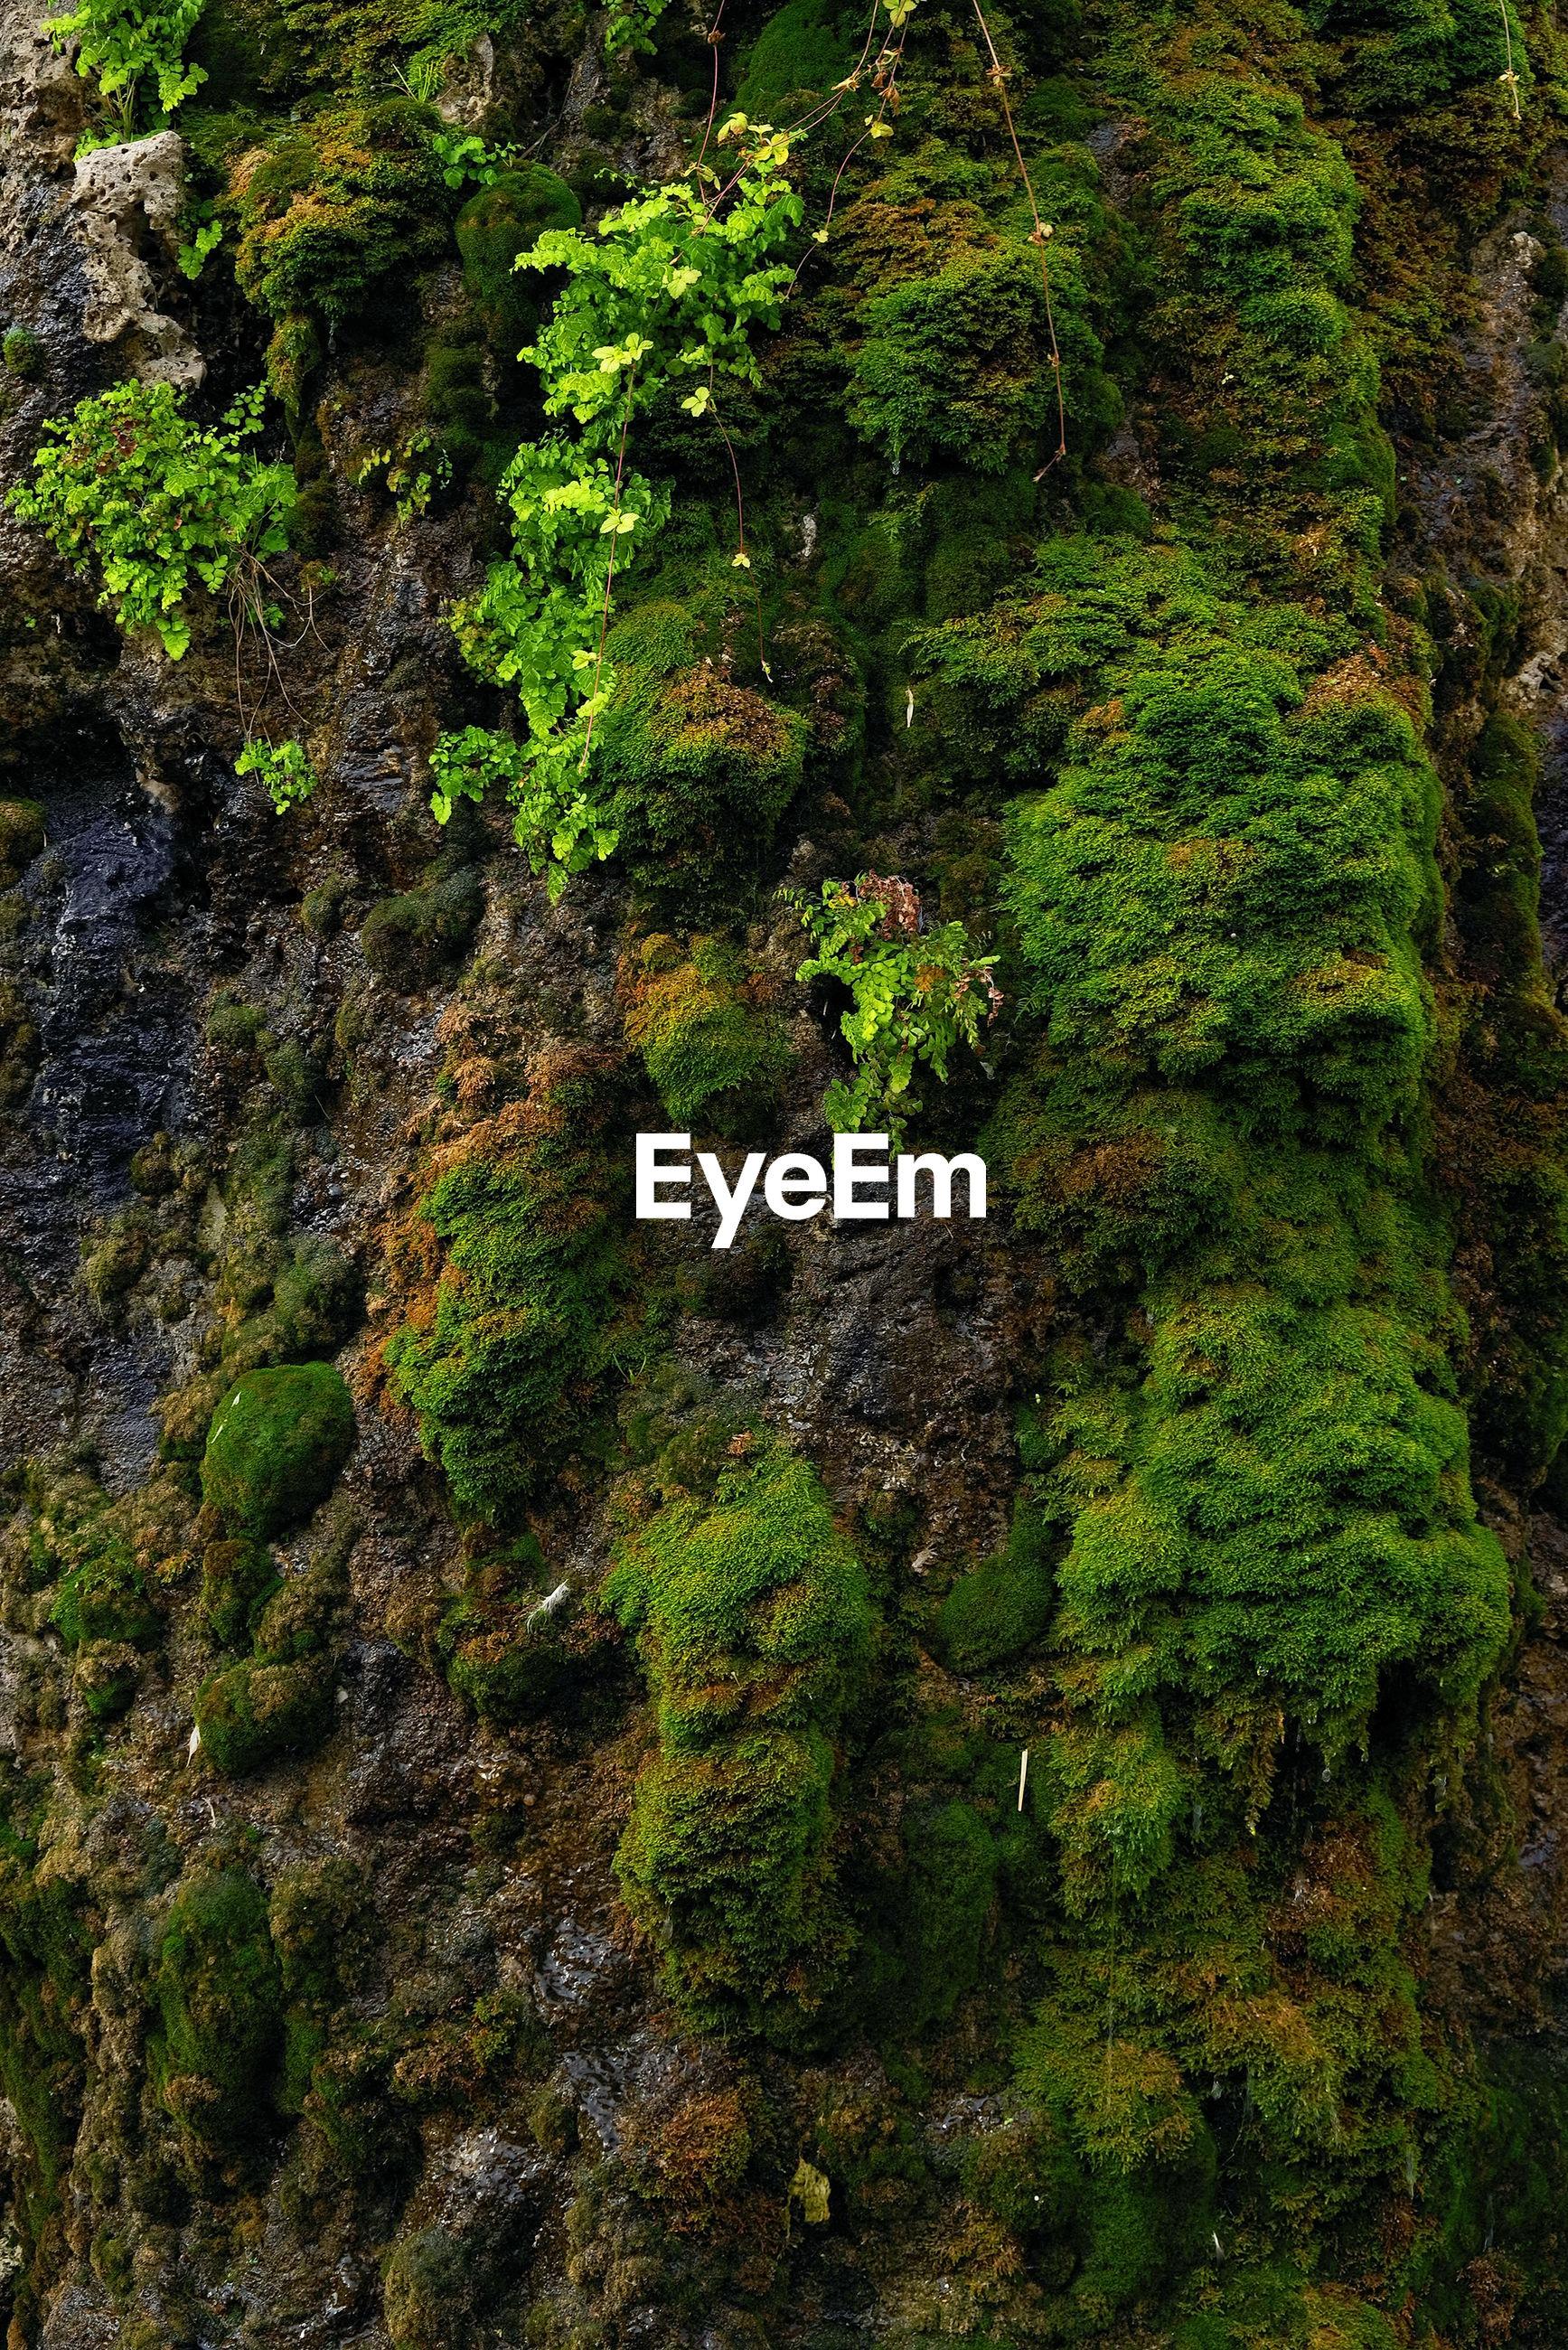 FULL FRAME SHOT OF TREES GROWING ON ROCK